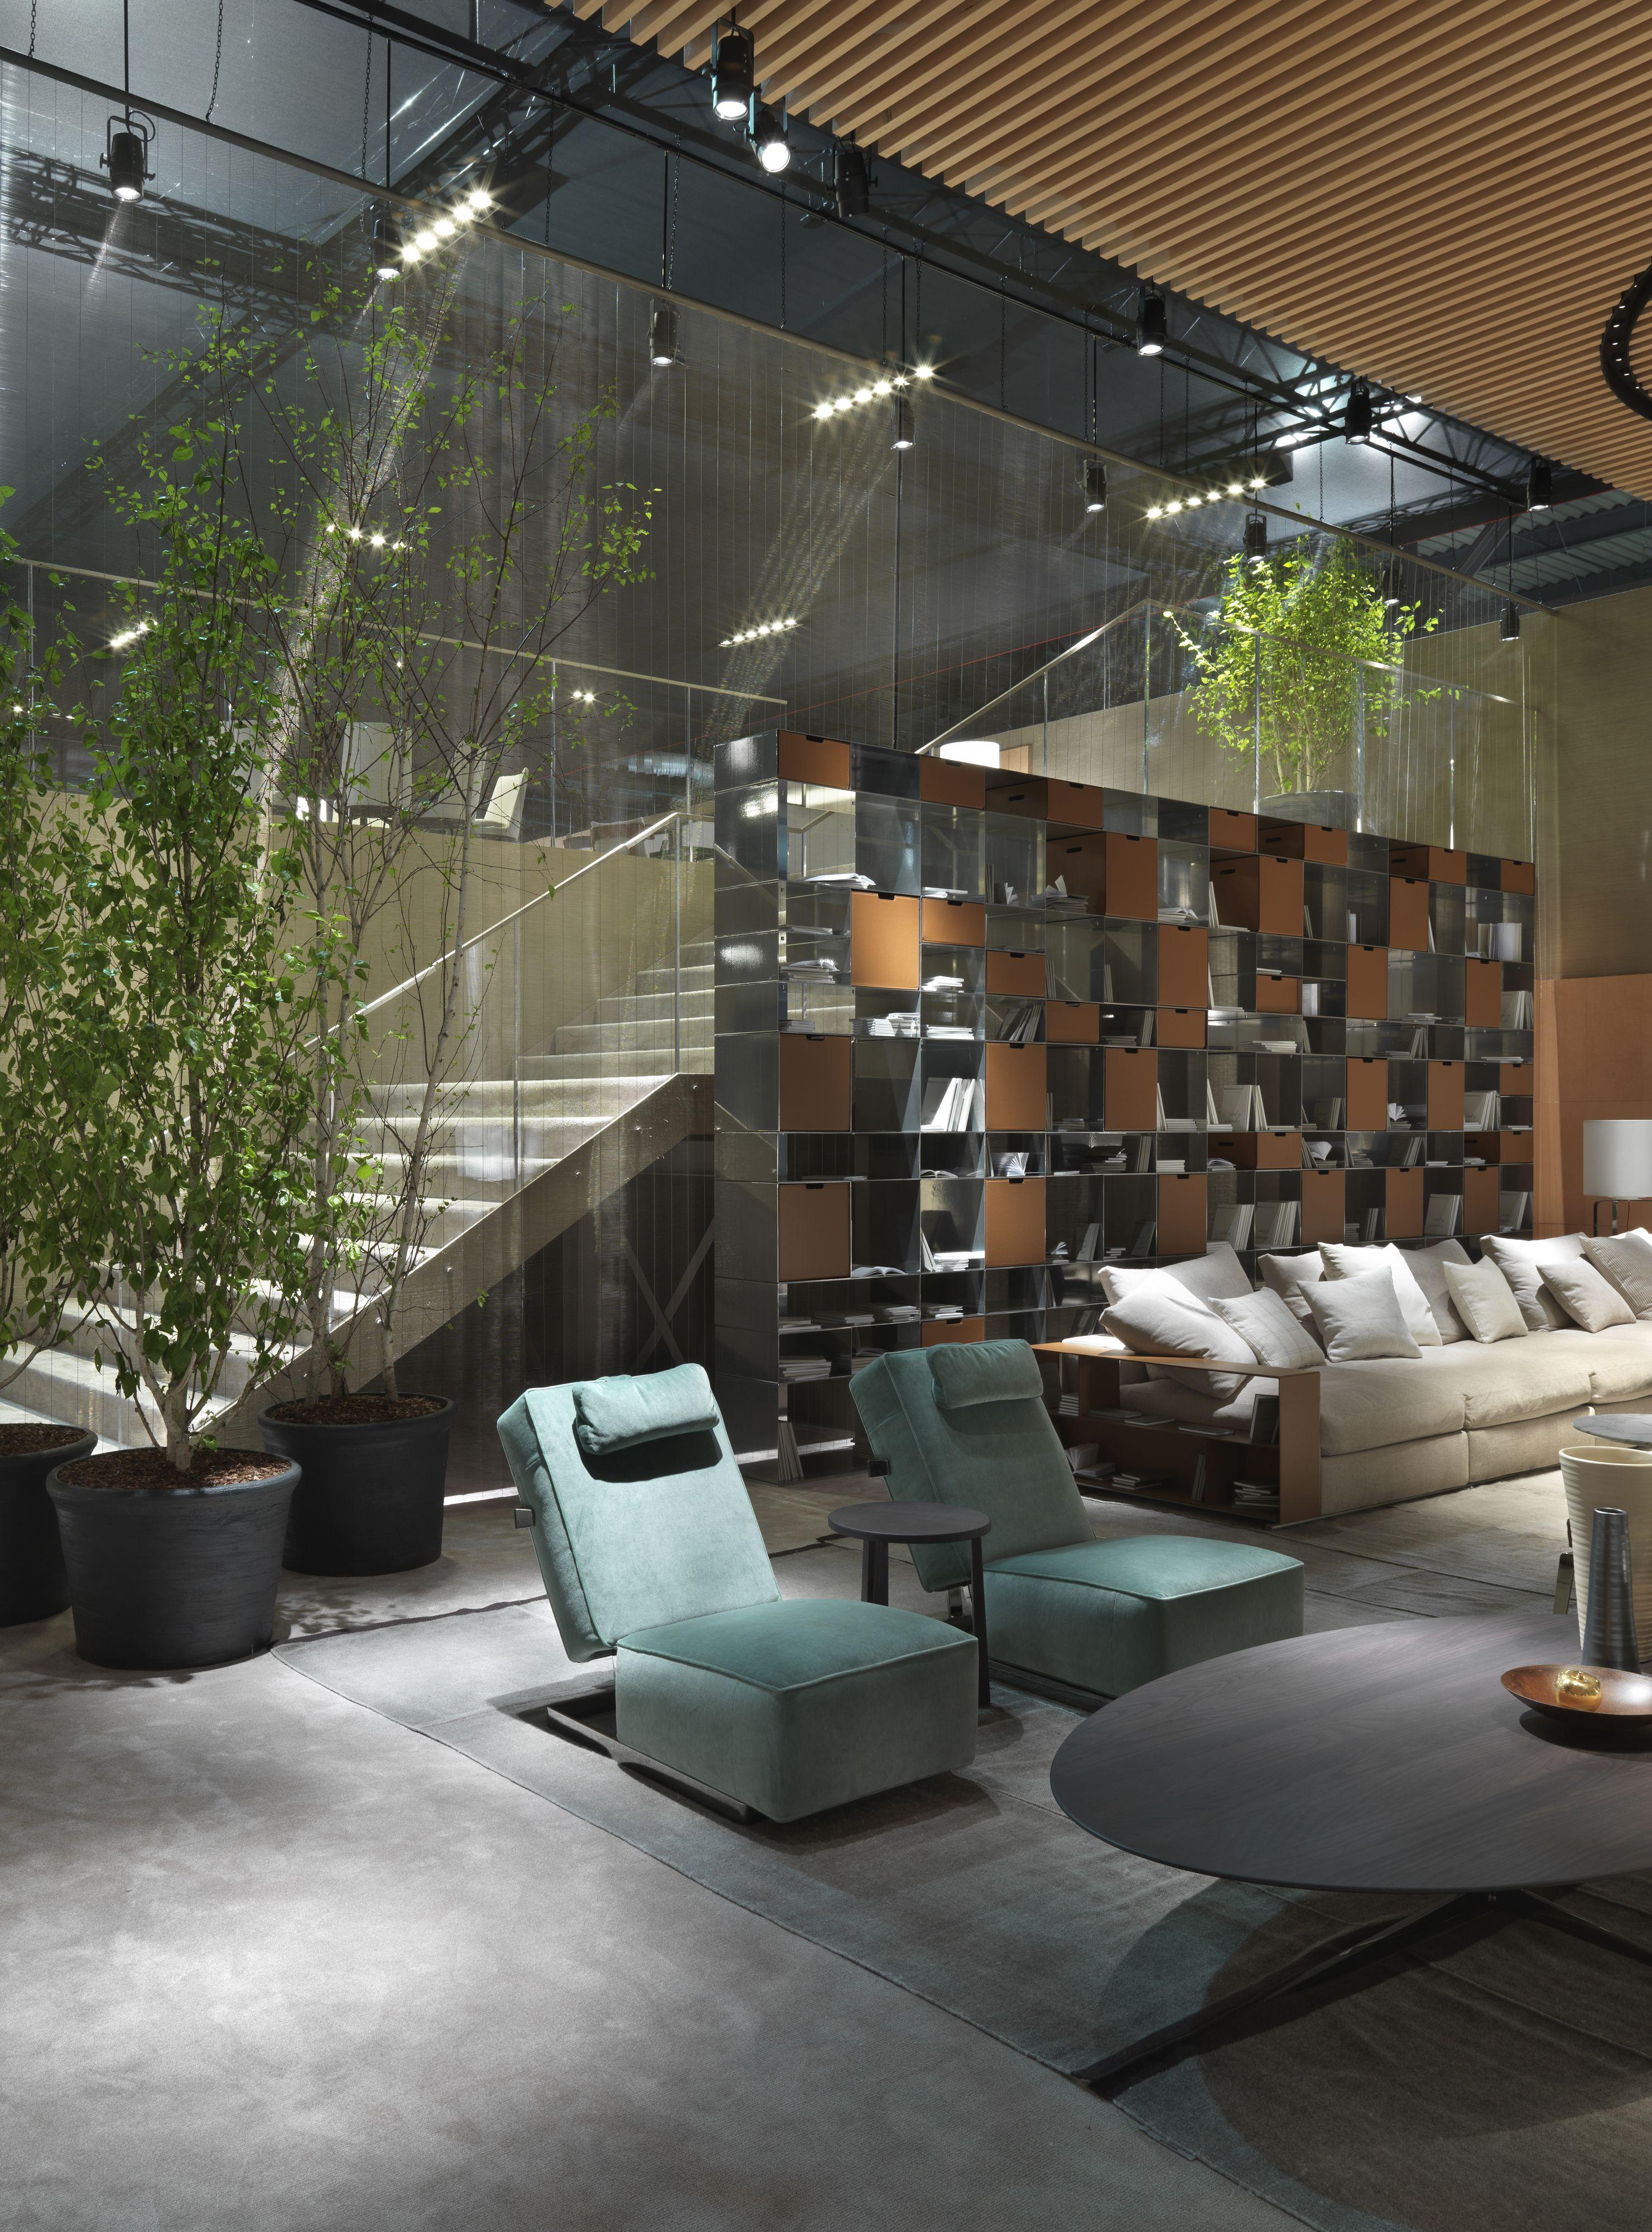 Rest area furniture showroom modern furniture poufs